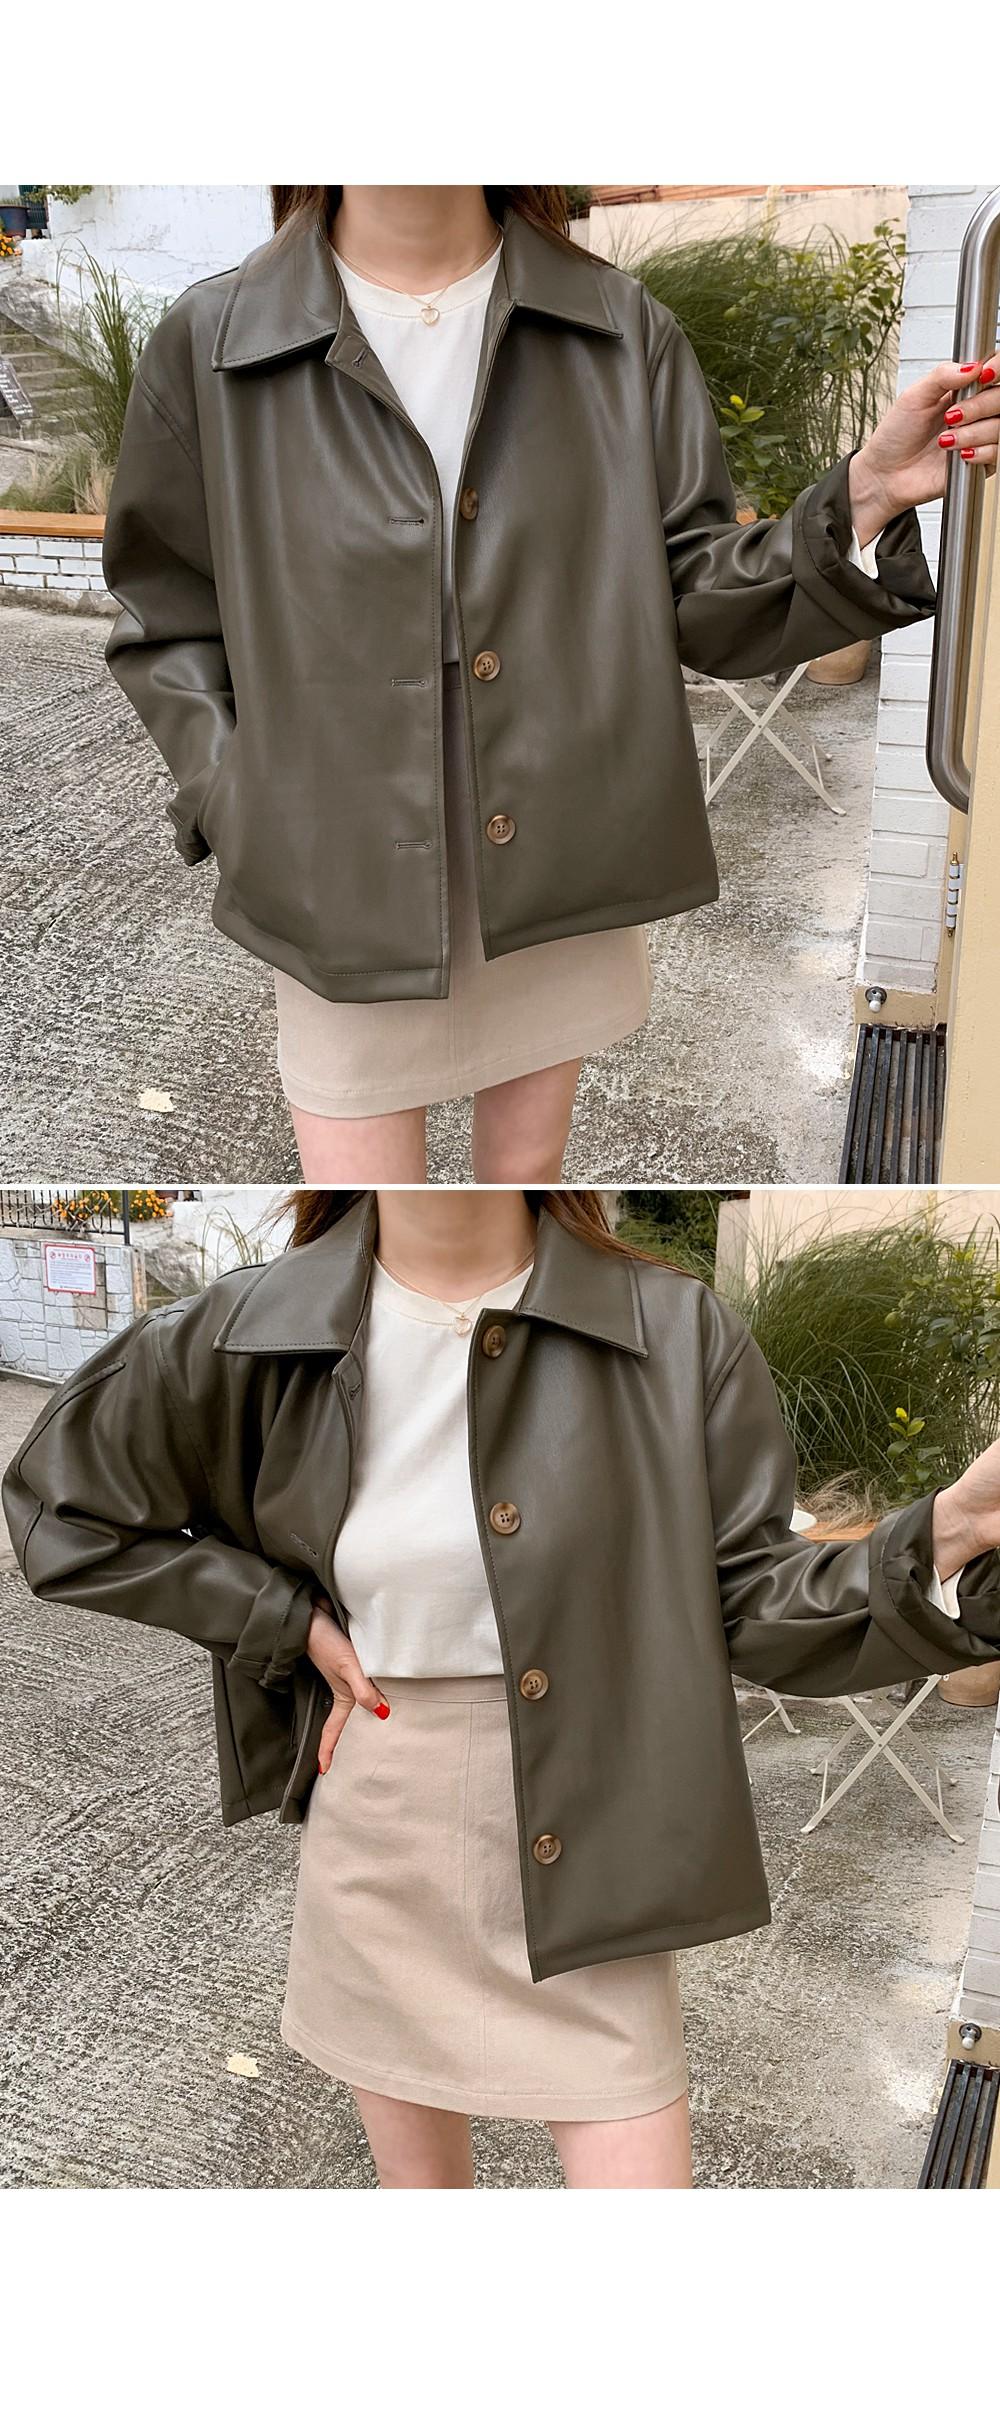 Matilda Leather JK